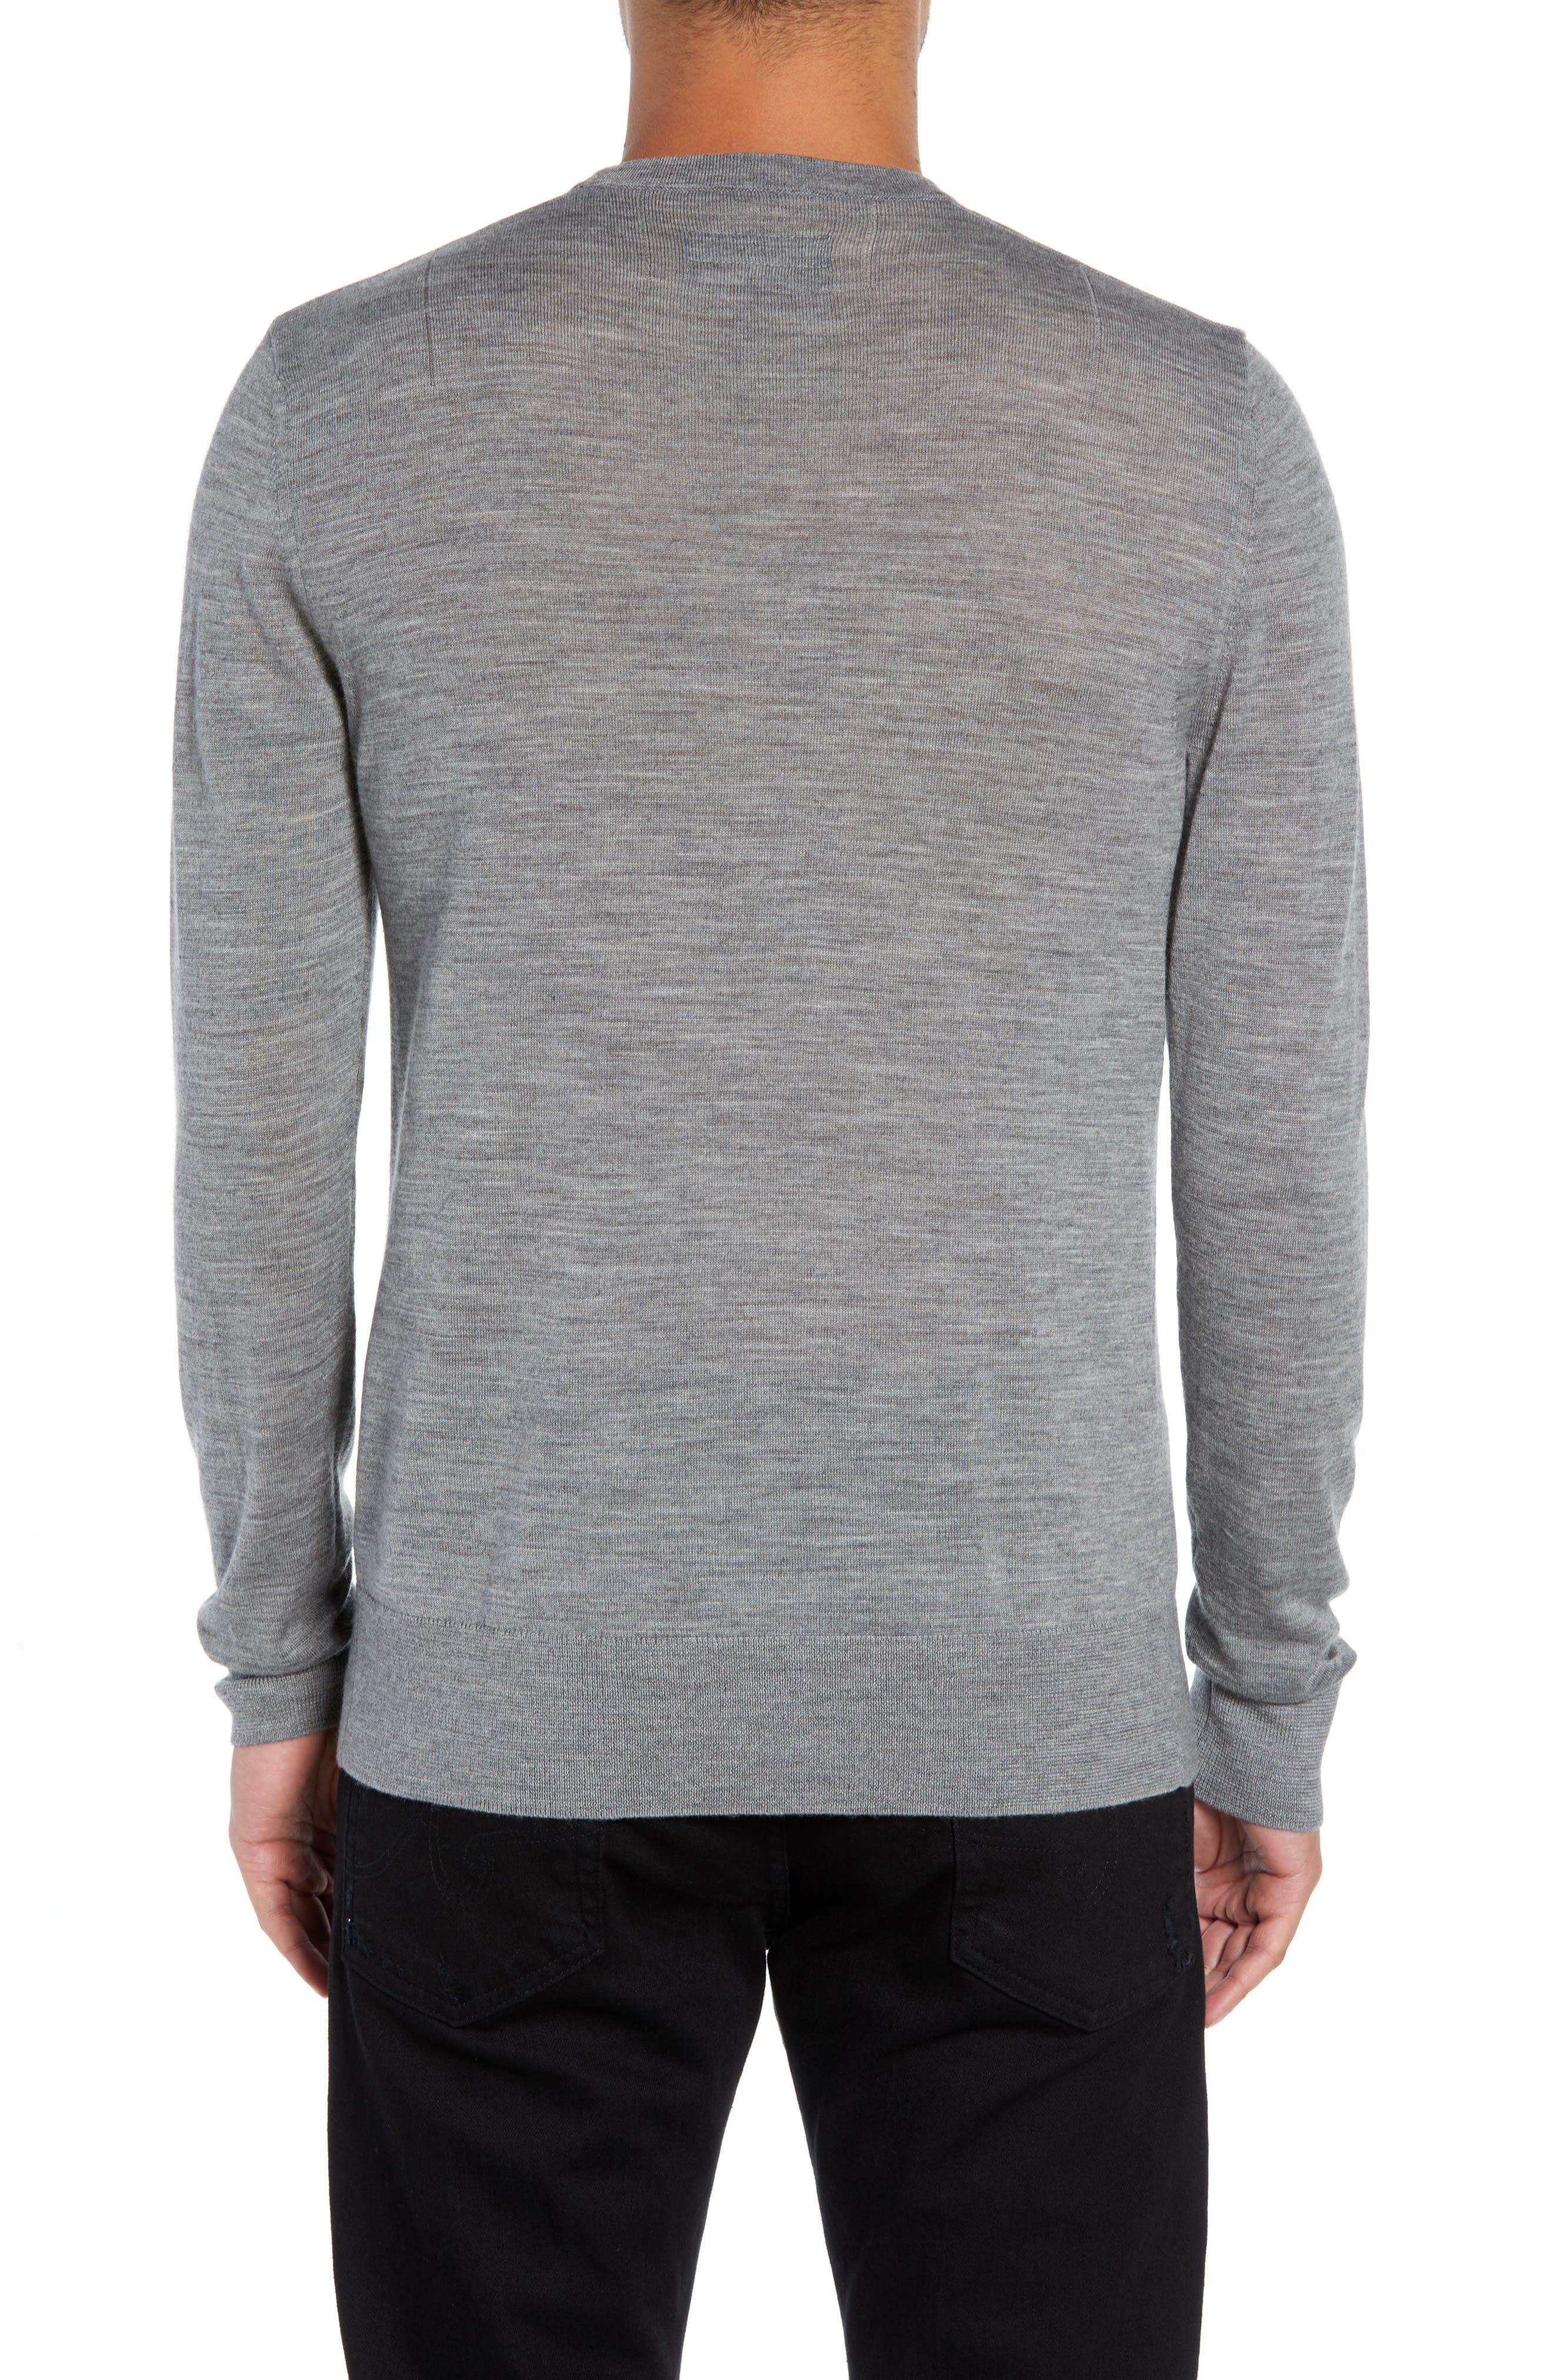 Mode Slim Fit Merino Wool Sweater,                             Alternate thumbnail 10, color,